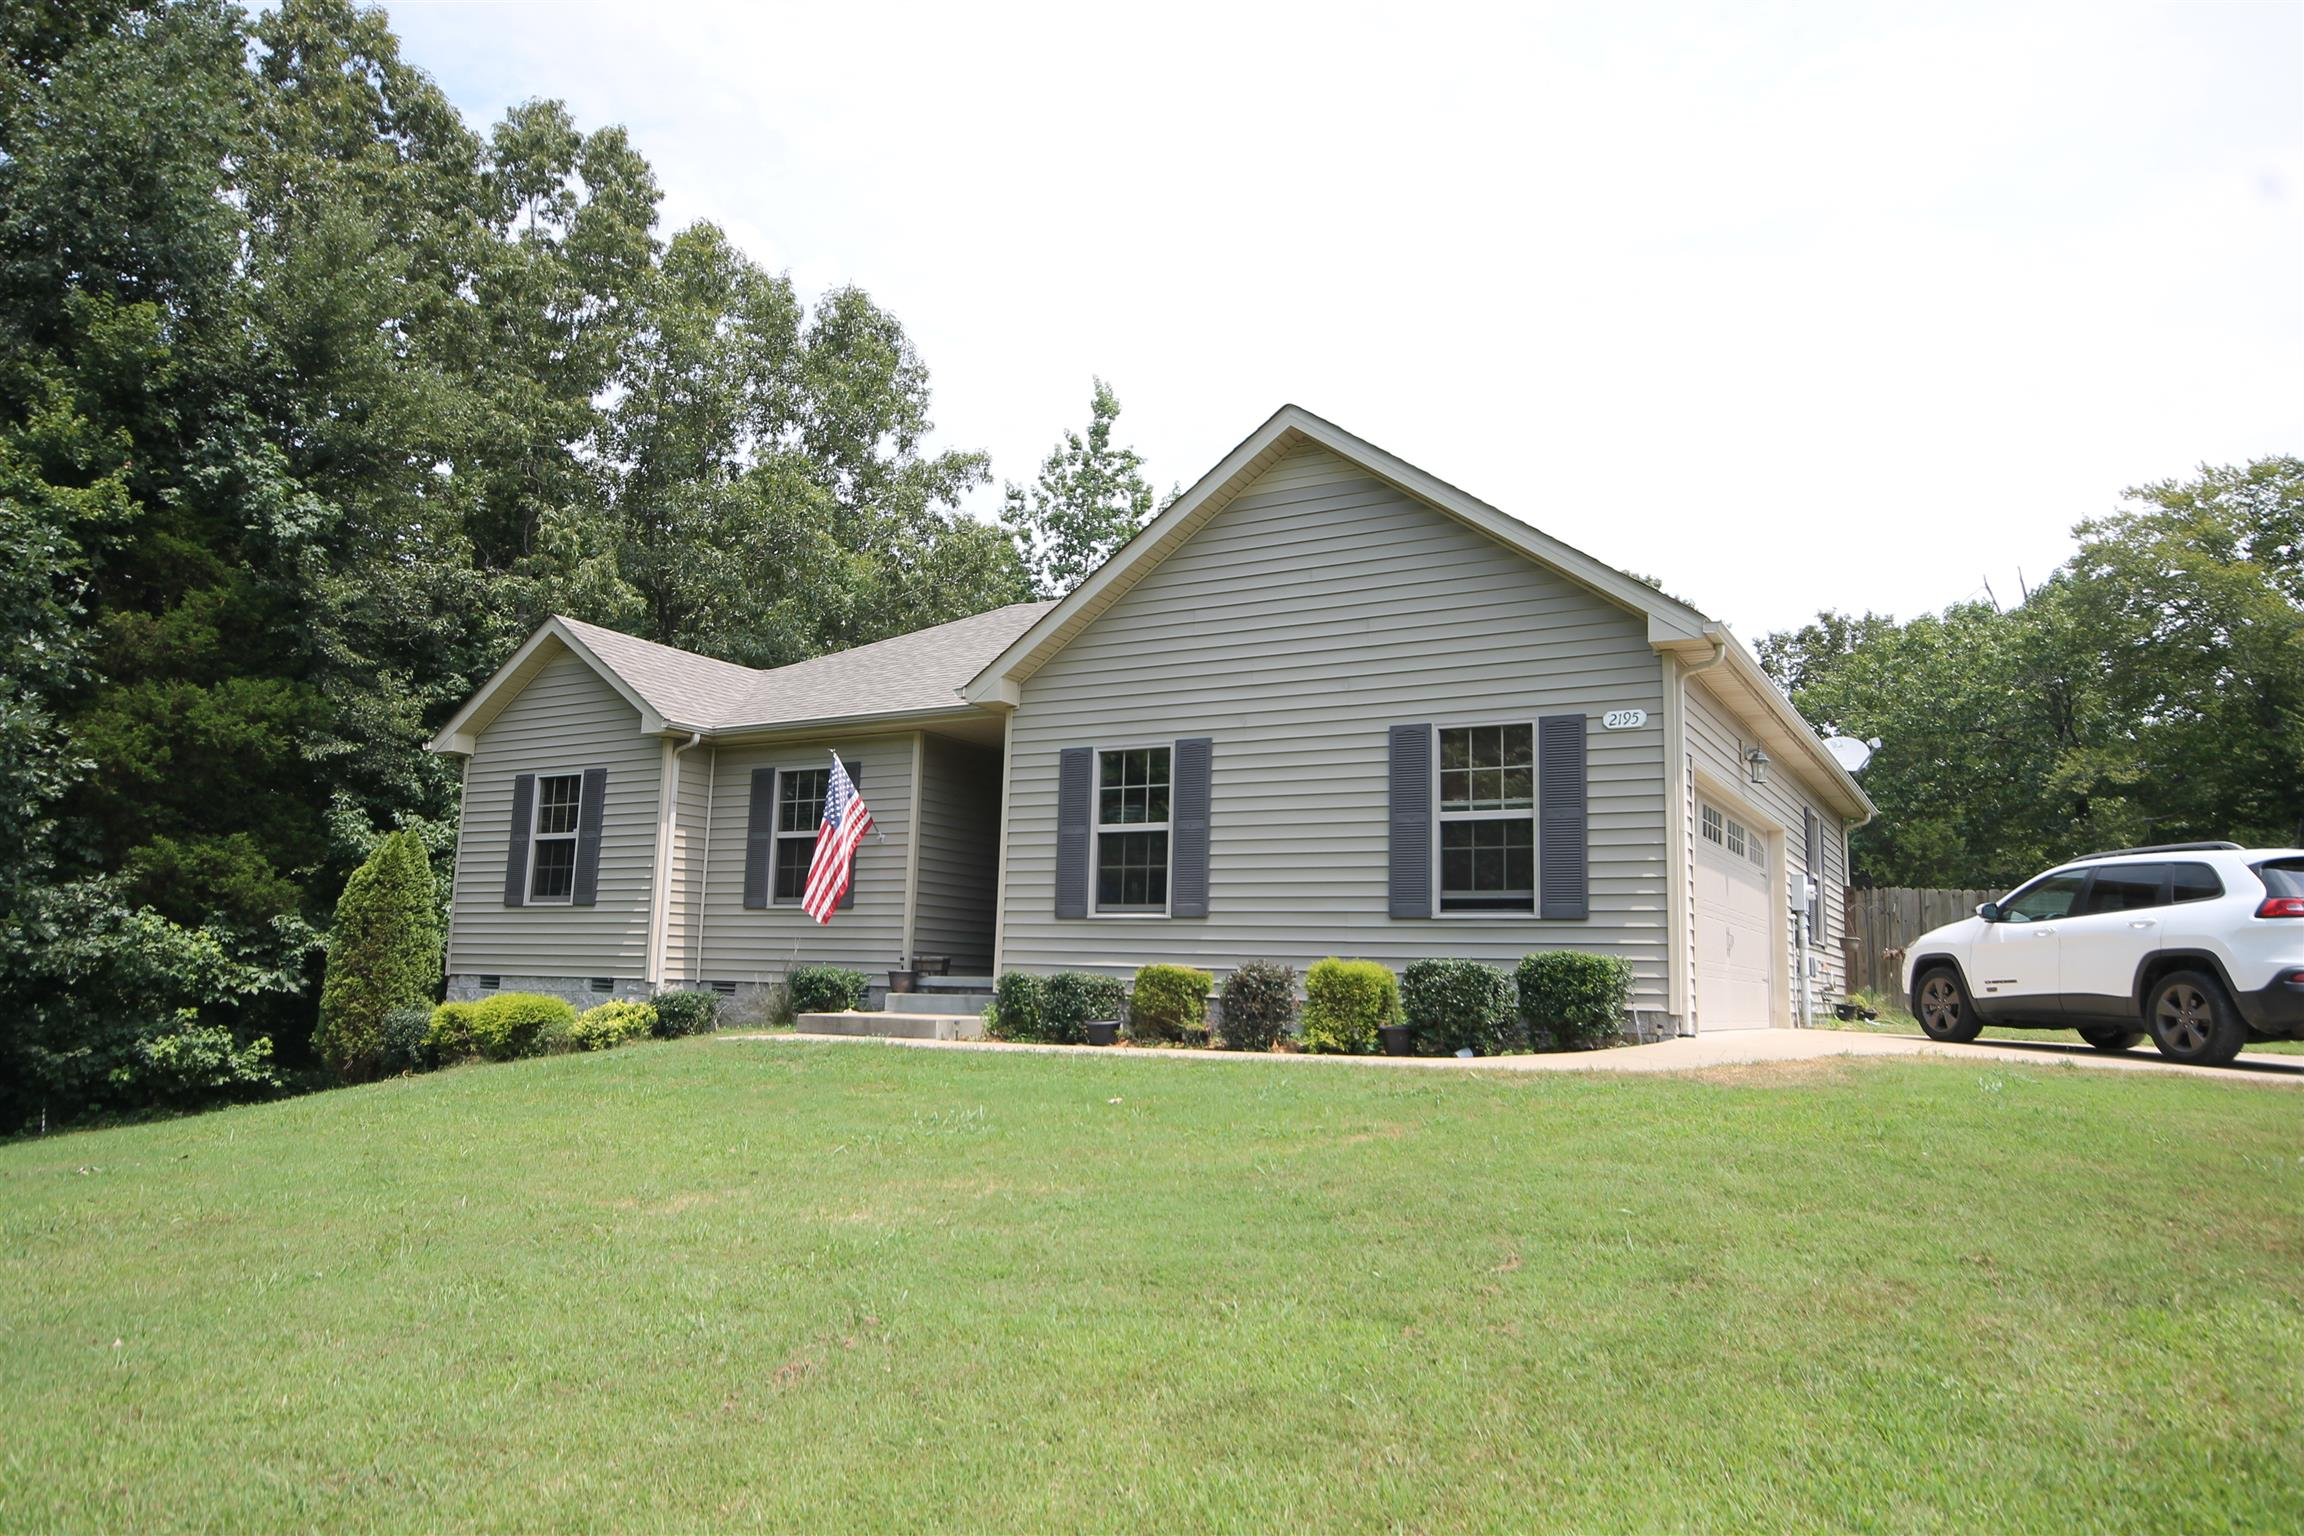 2195 River Rd, Clarksville, TN 37040 - Clarksville, TN real estate listing